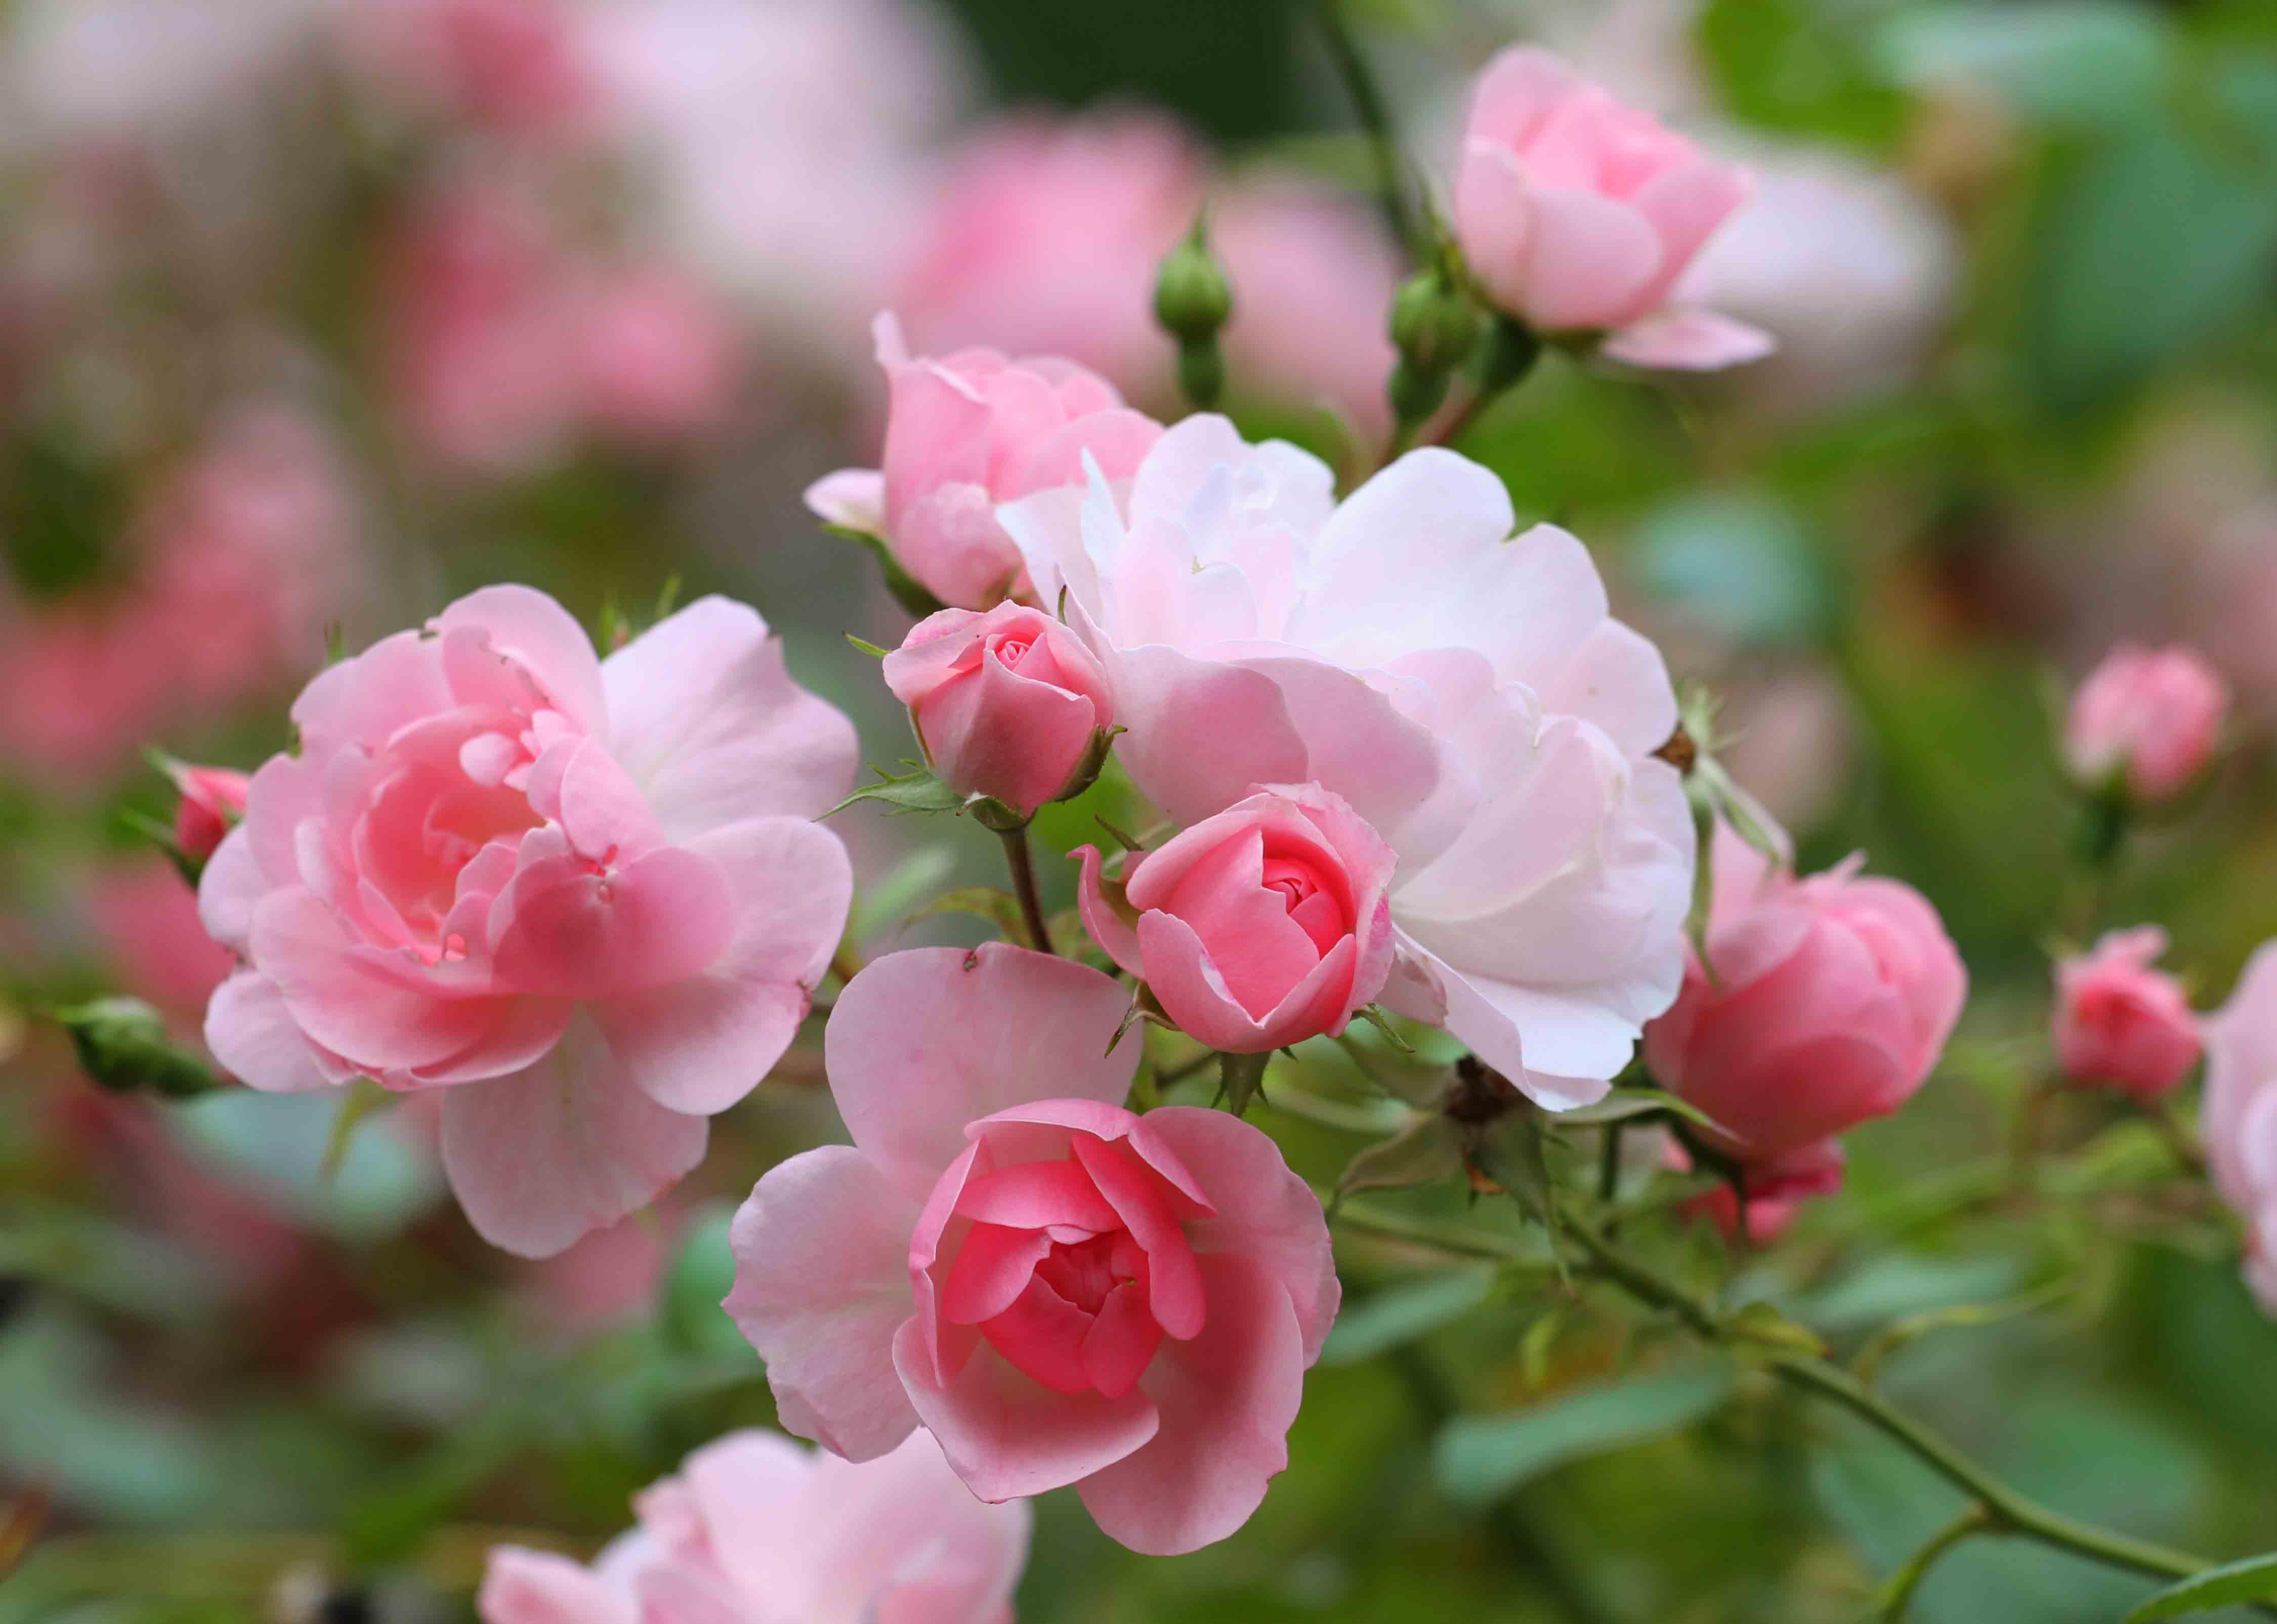 Blumenwellness